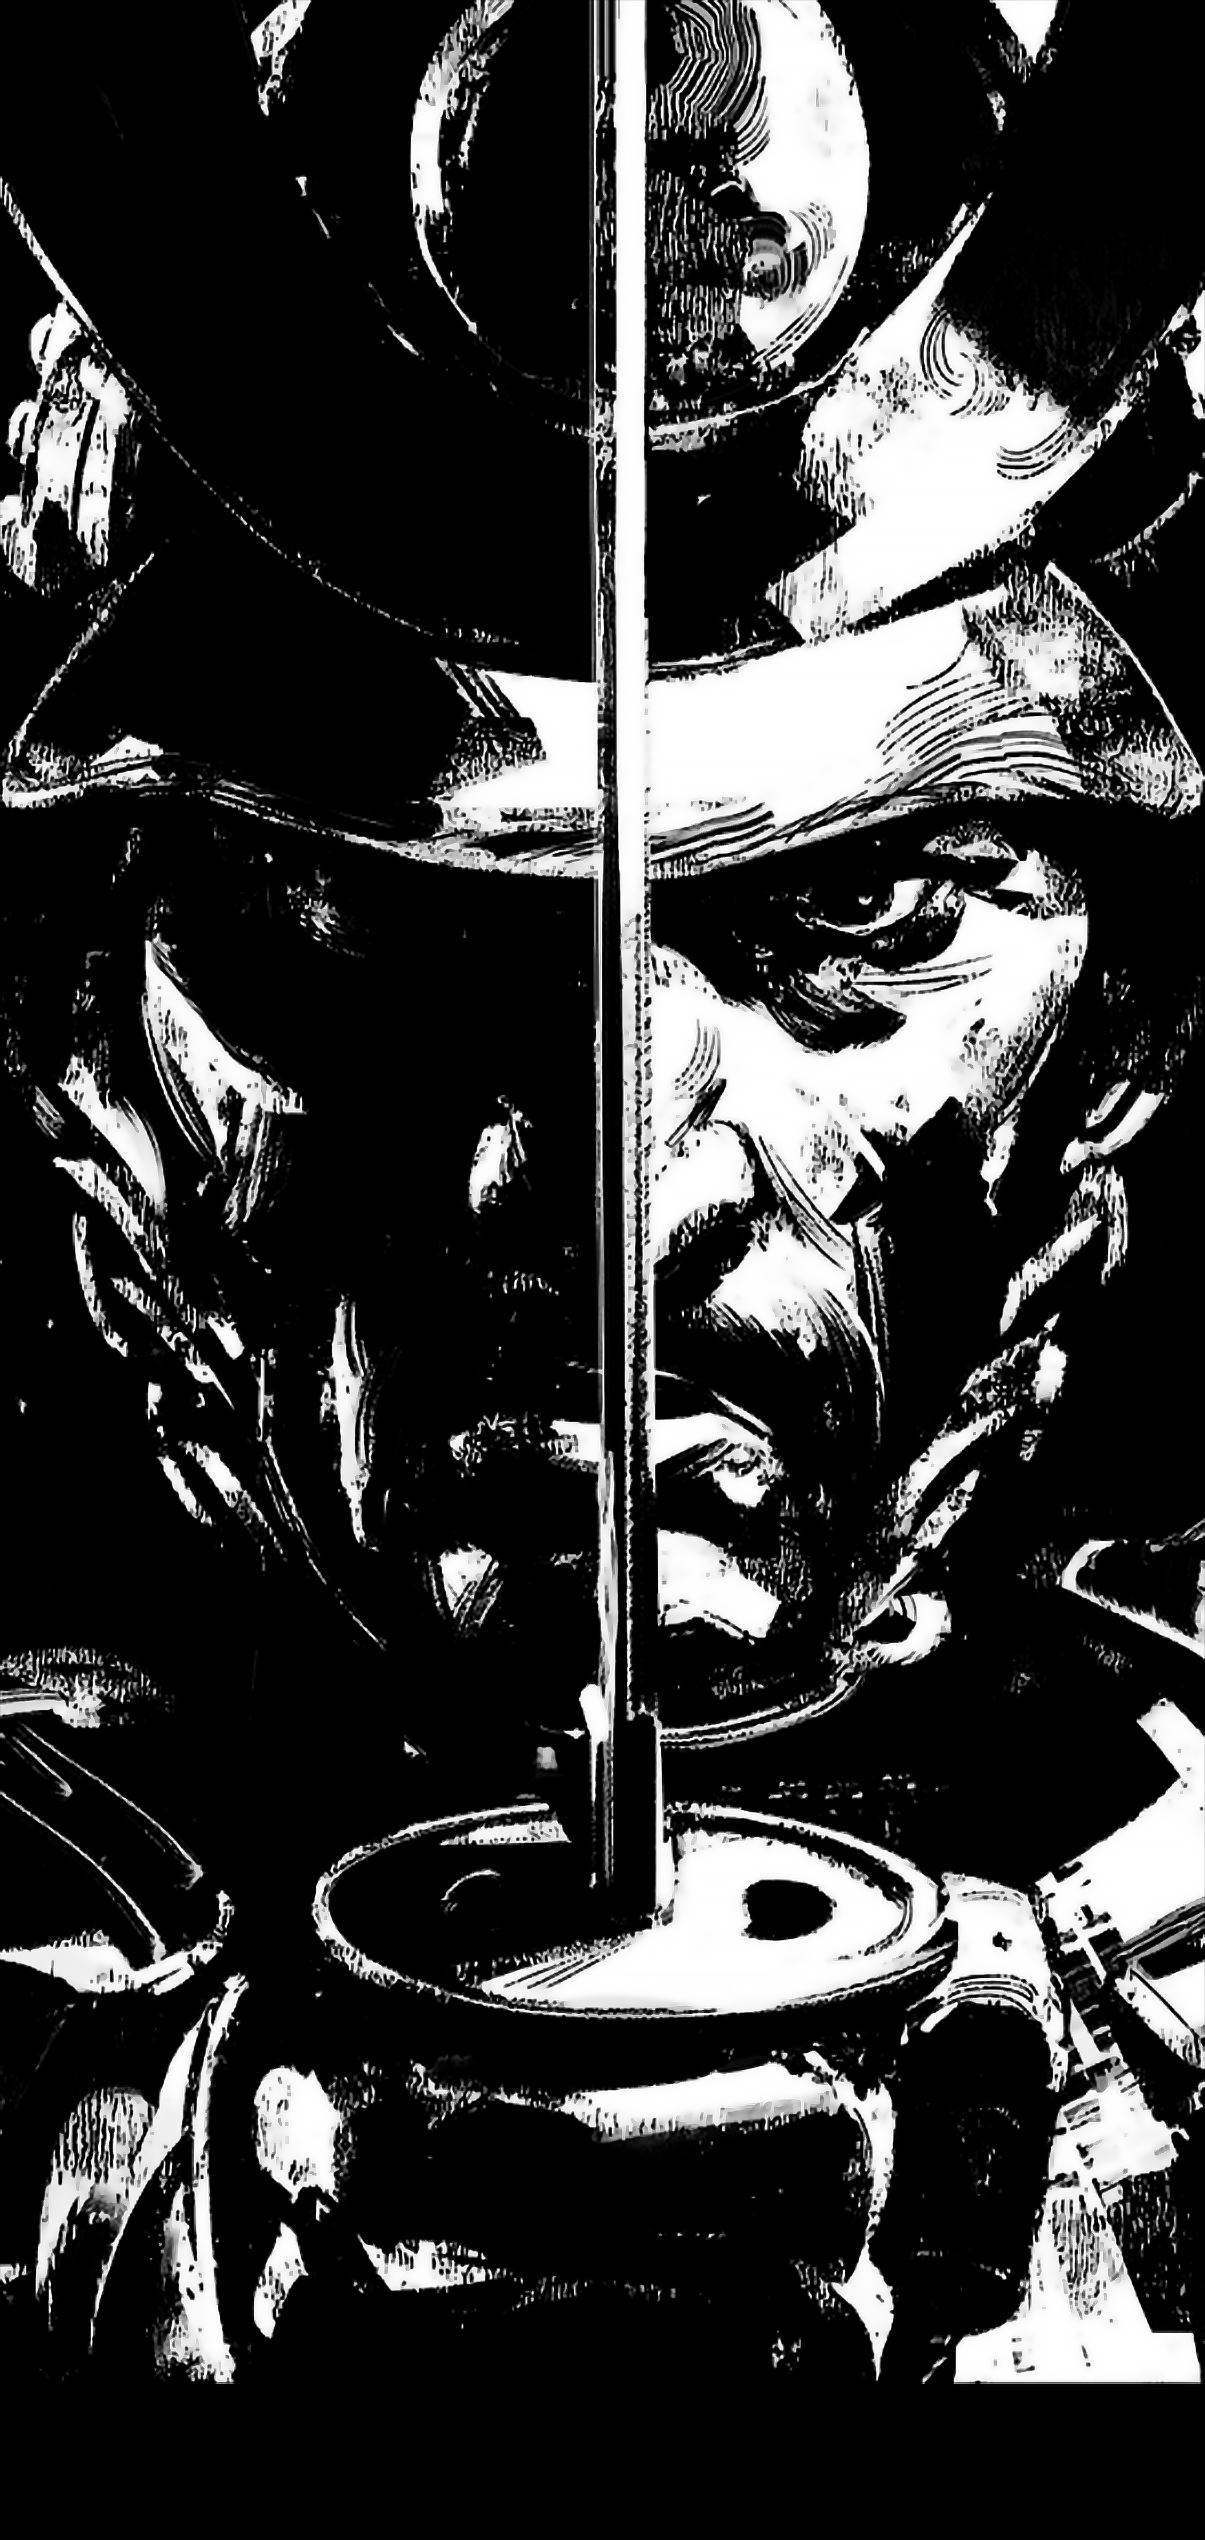 BLACK AMOLED WALLPAPER - GHOST OF TSUSHIMA